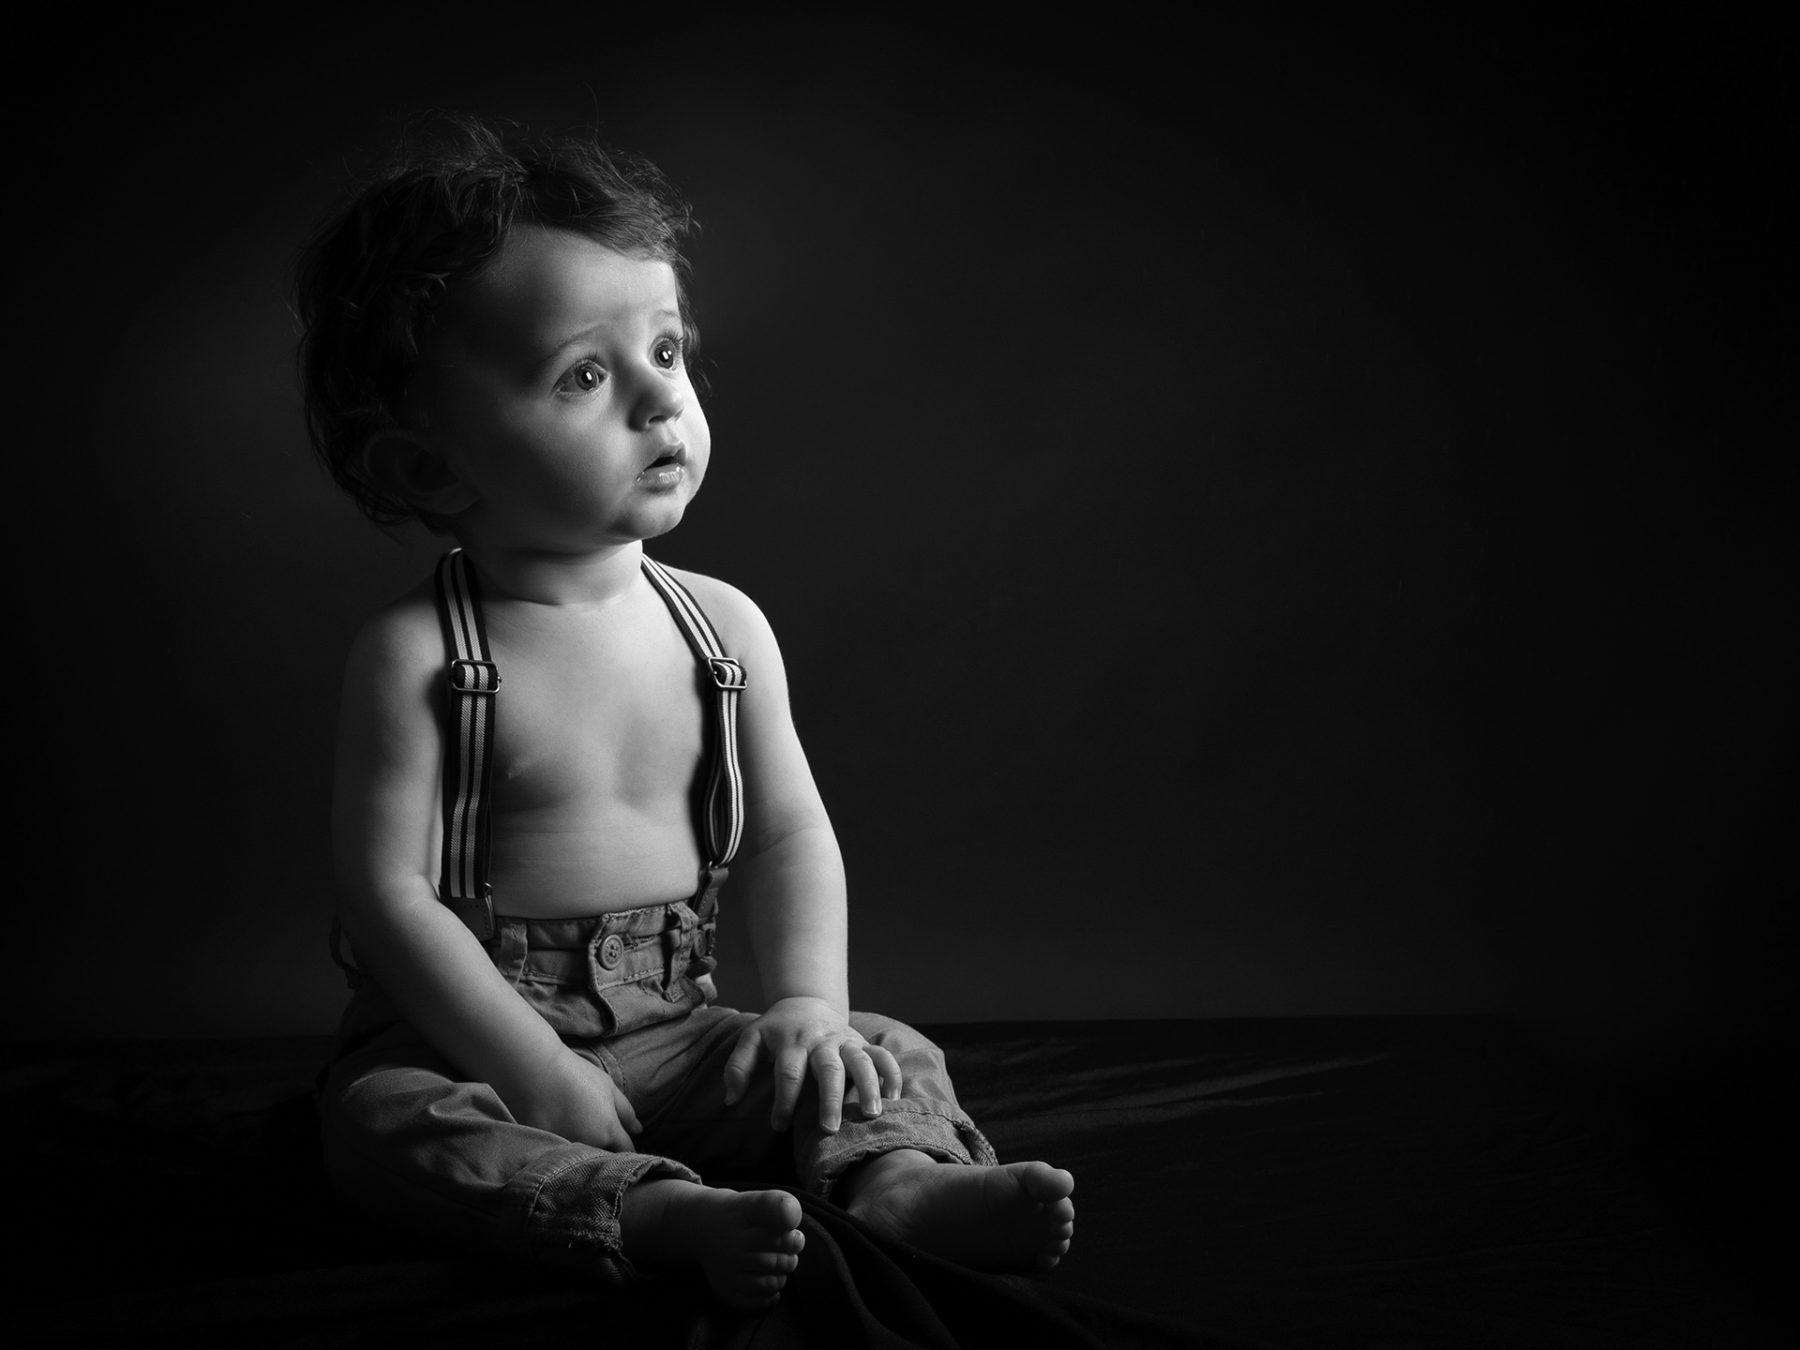 Séance photo studio avec un petit garçon